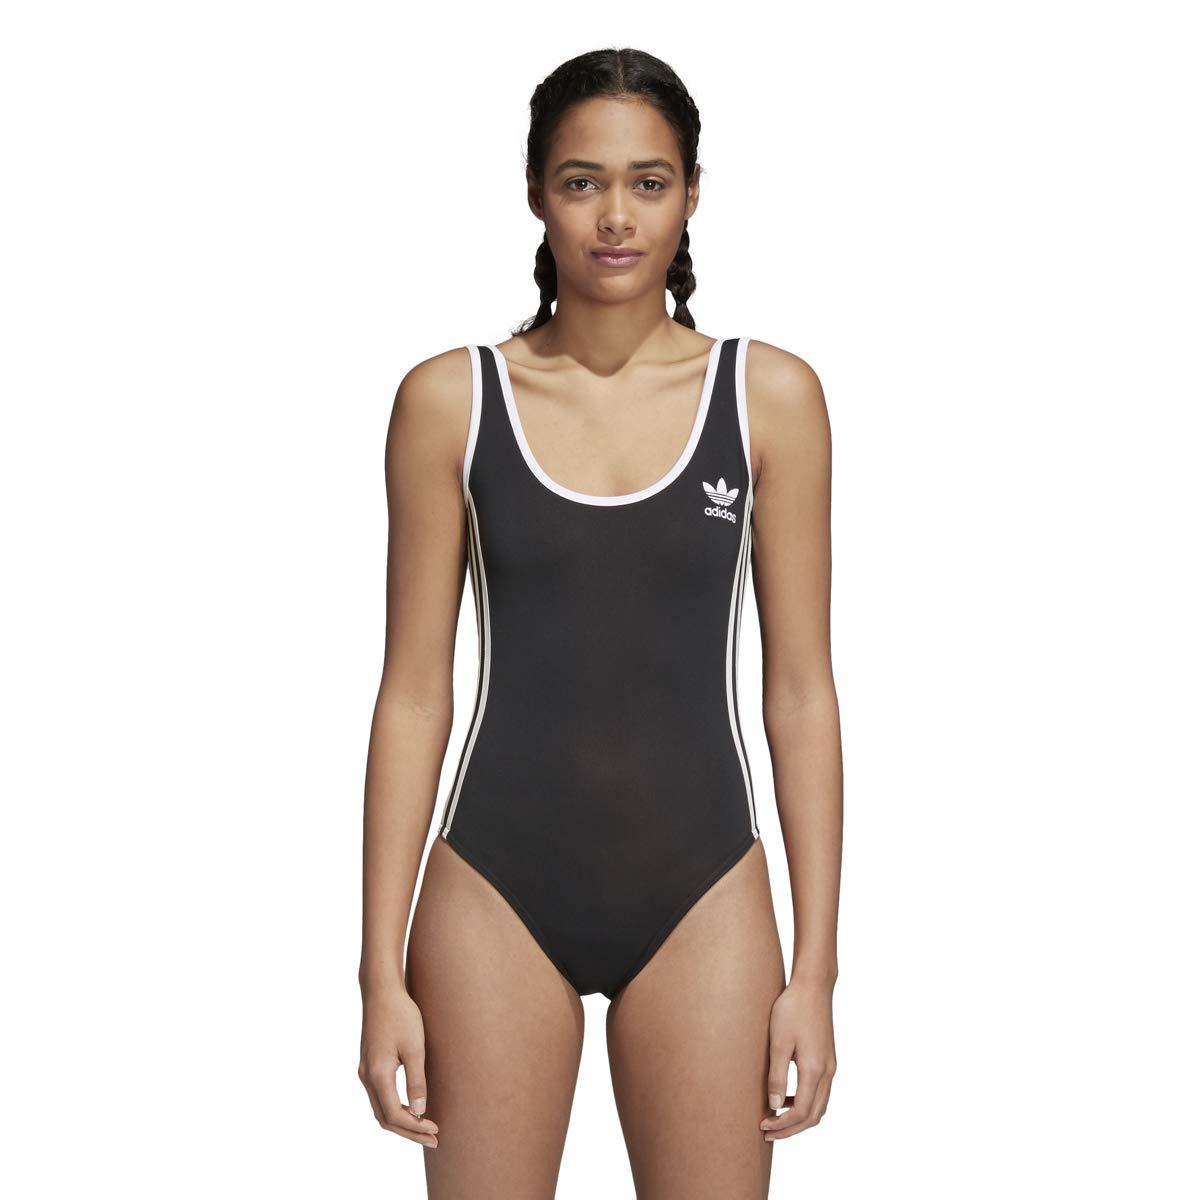 7461e0655be adidas Women's Originals 3-Stripes Bodysuit at Amazon Women's Clothing  store: